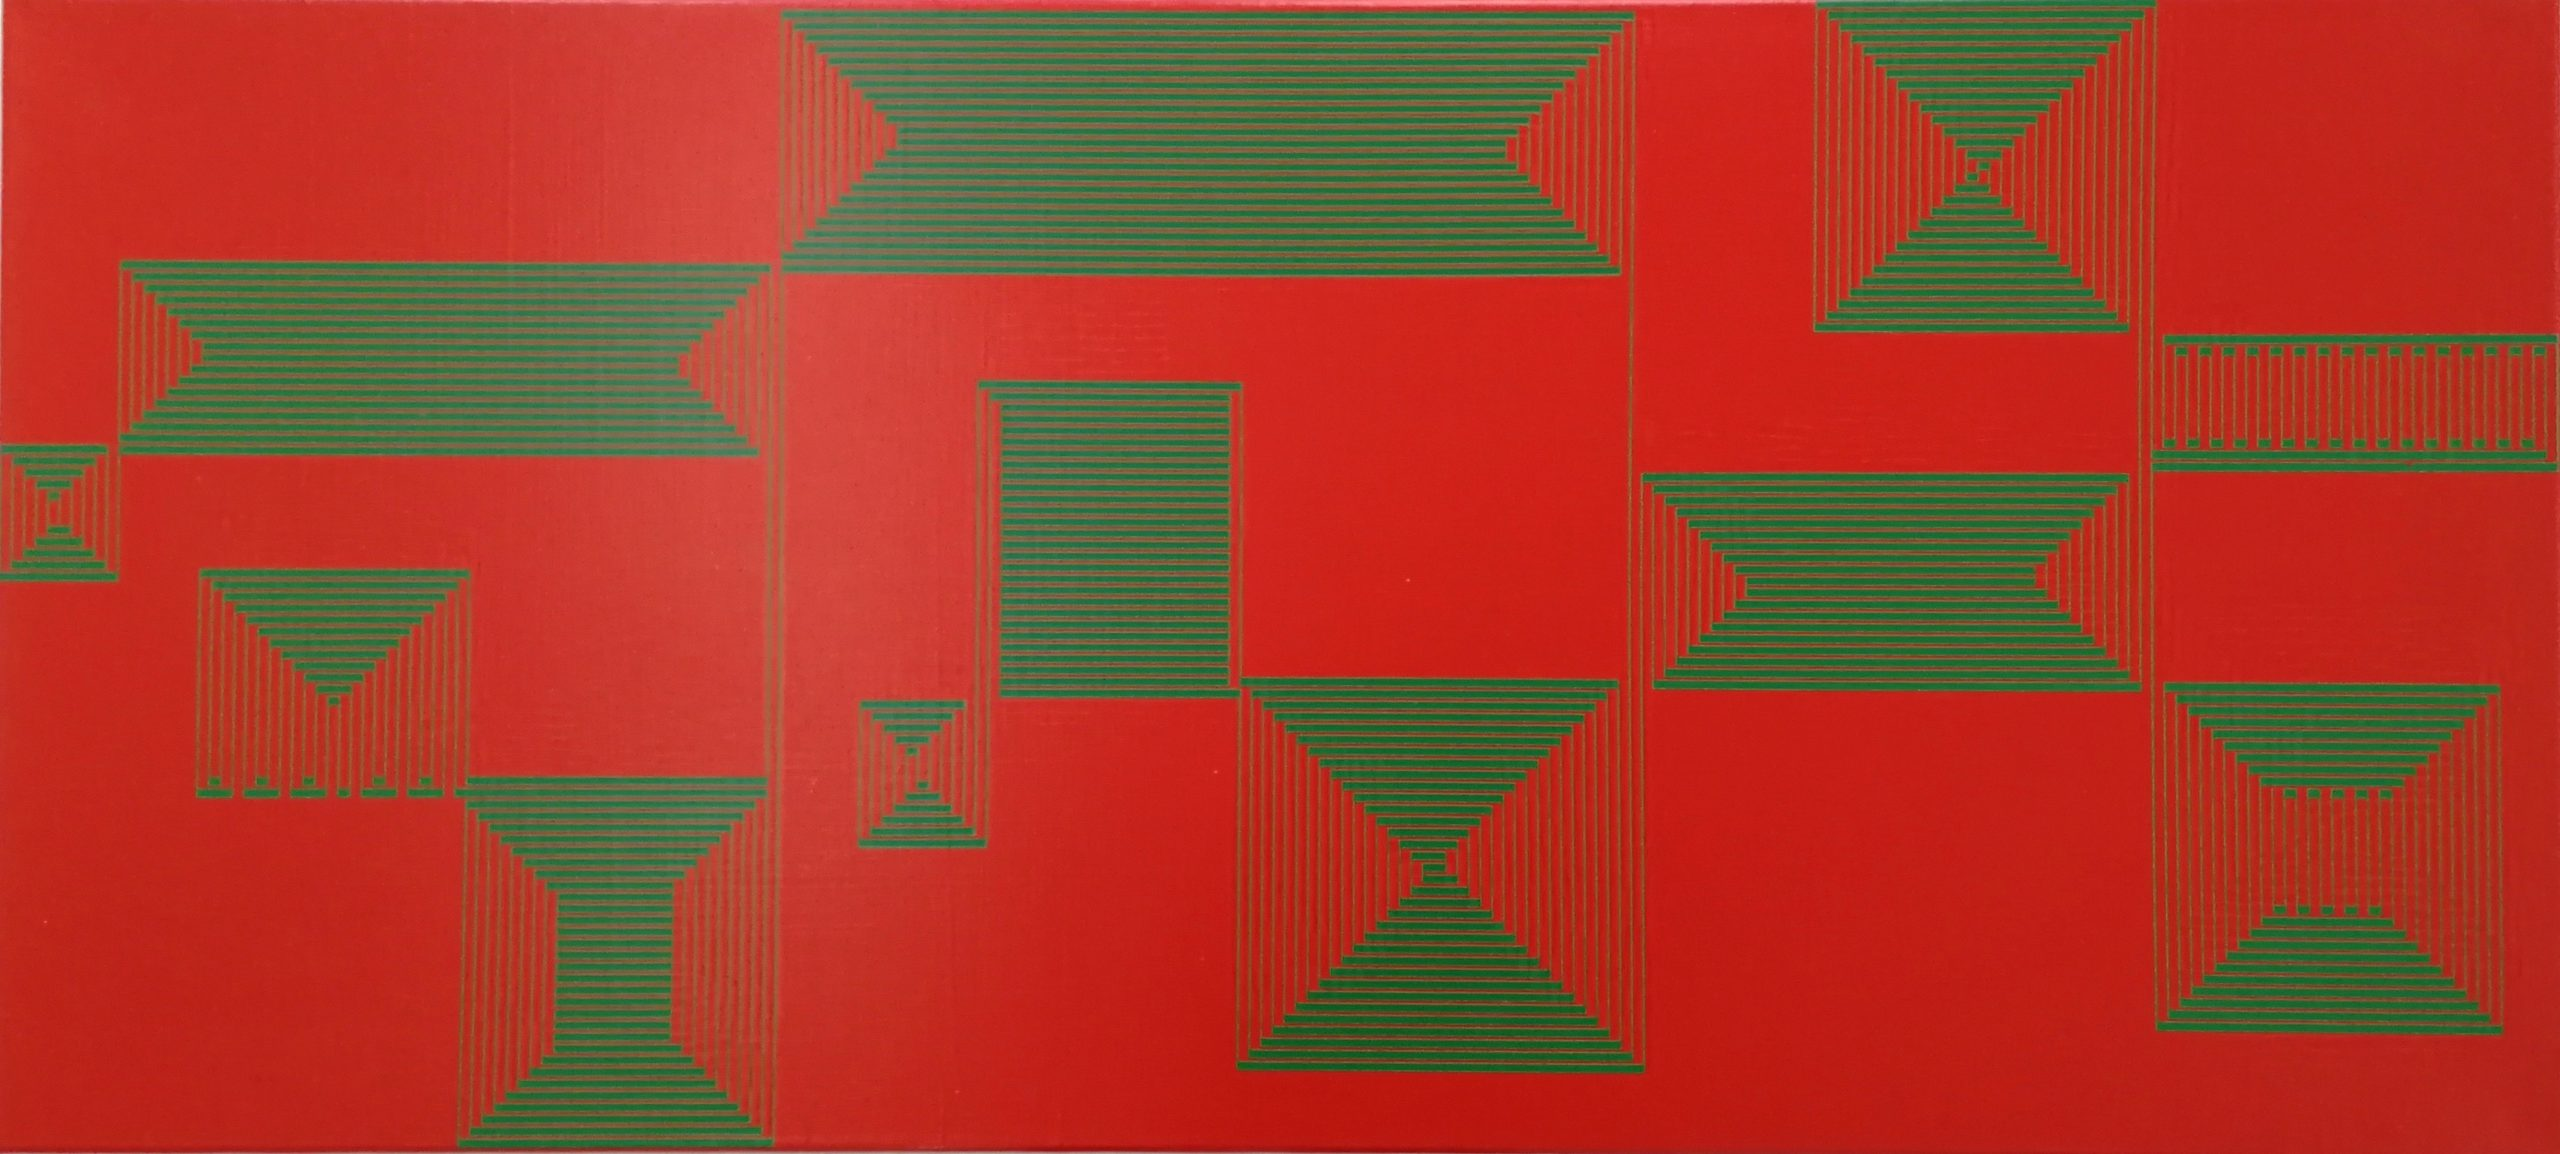 Vera Molnar, Ligne B, Acryl auf Leinwand, 50 x 110 cm, 2015